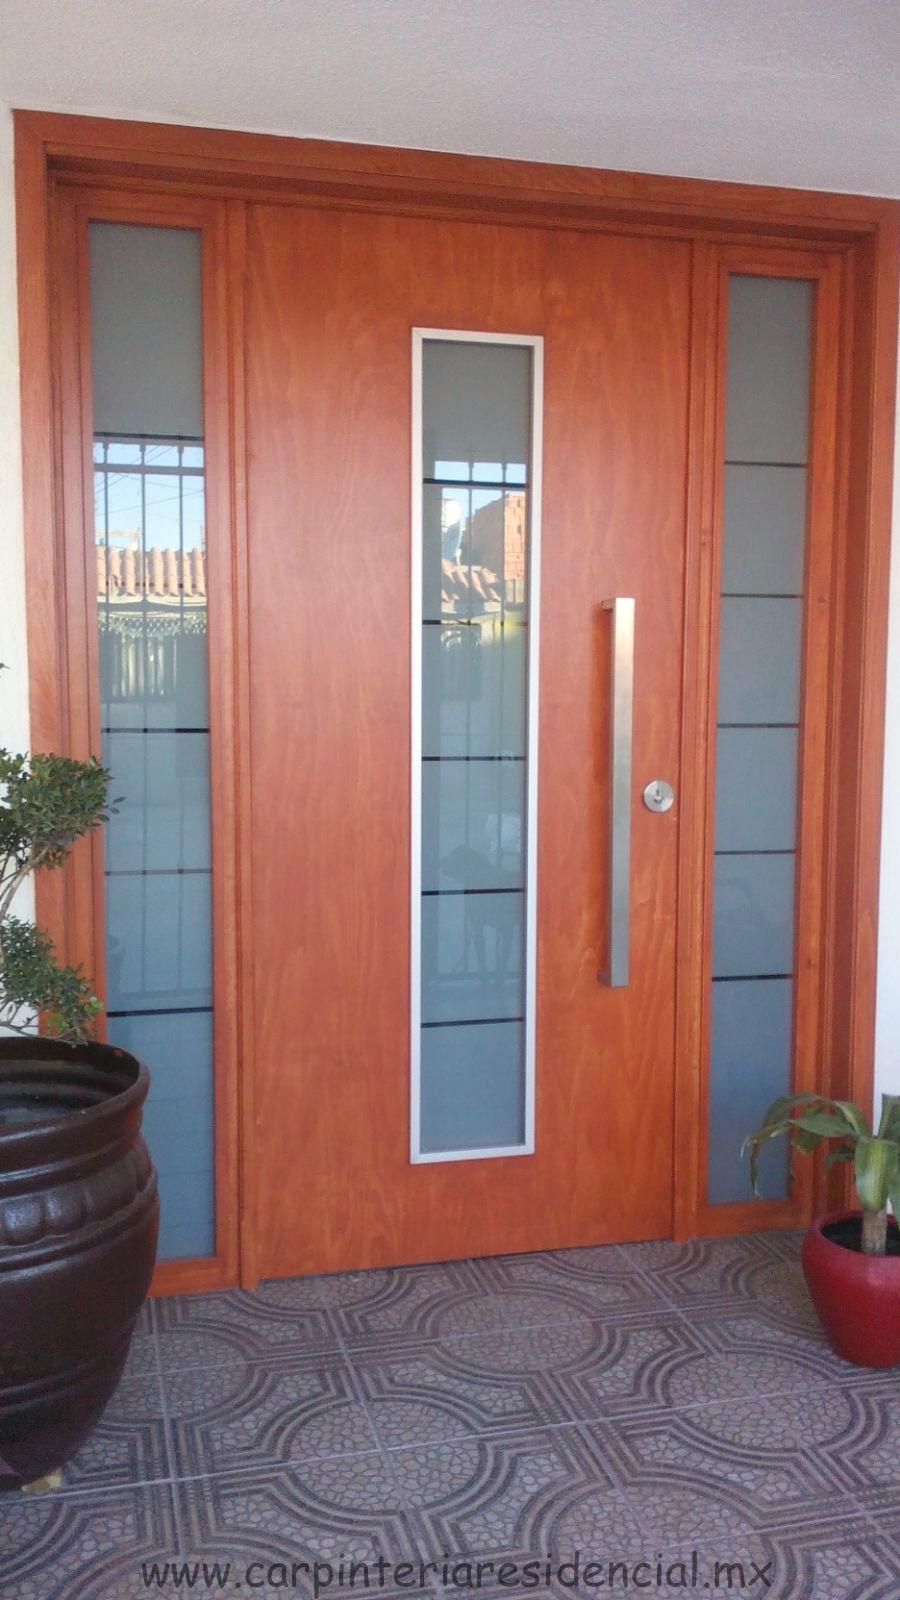 Puertas de madera con vidrio ideas de disenos for Puertas de madera con cristal